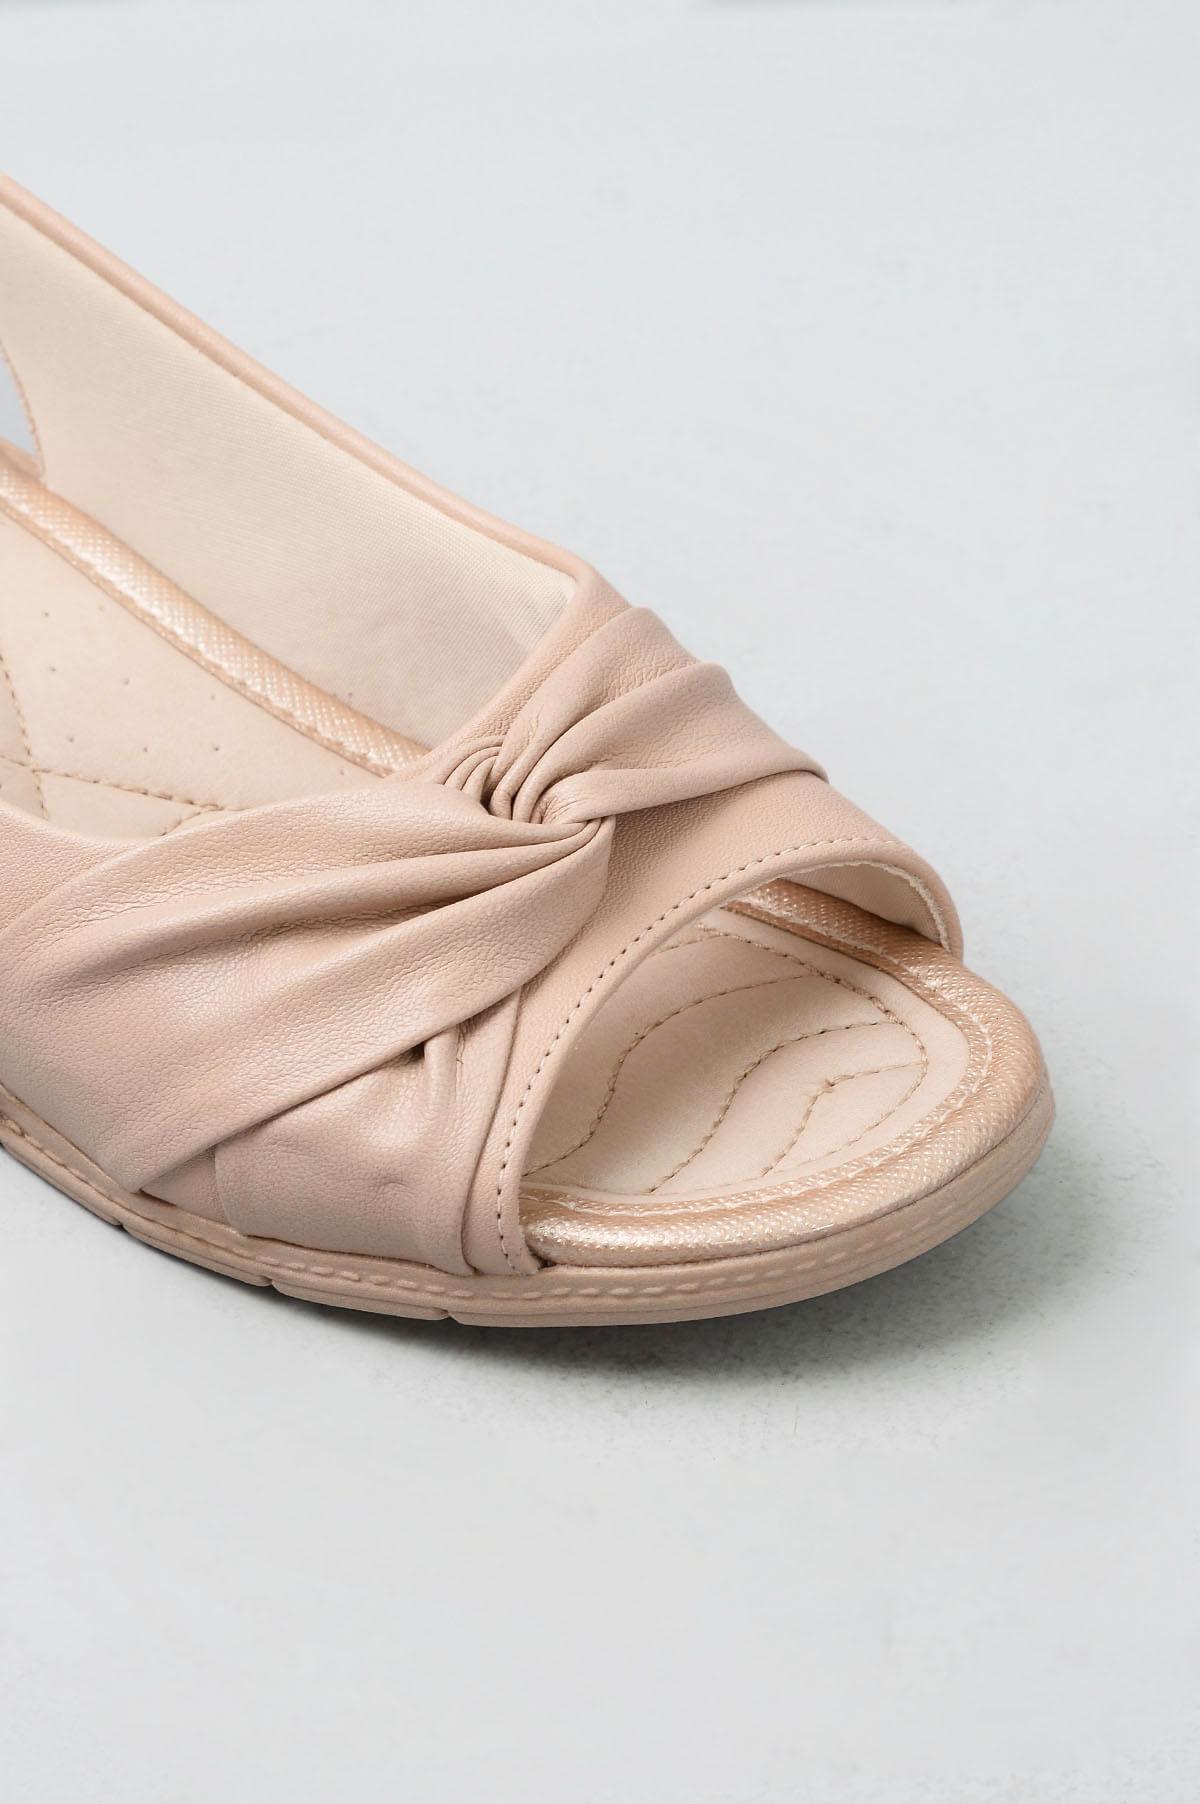 18d2dc36c Sandália Feminina Ultrasoft Comfort Flex SINT - NUDE - Mundial Calçados